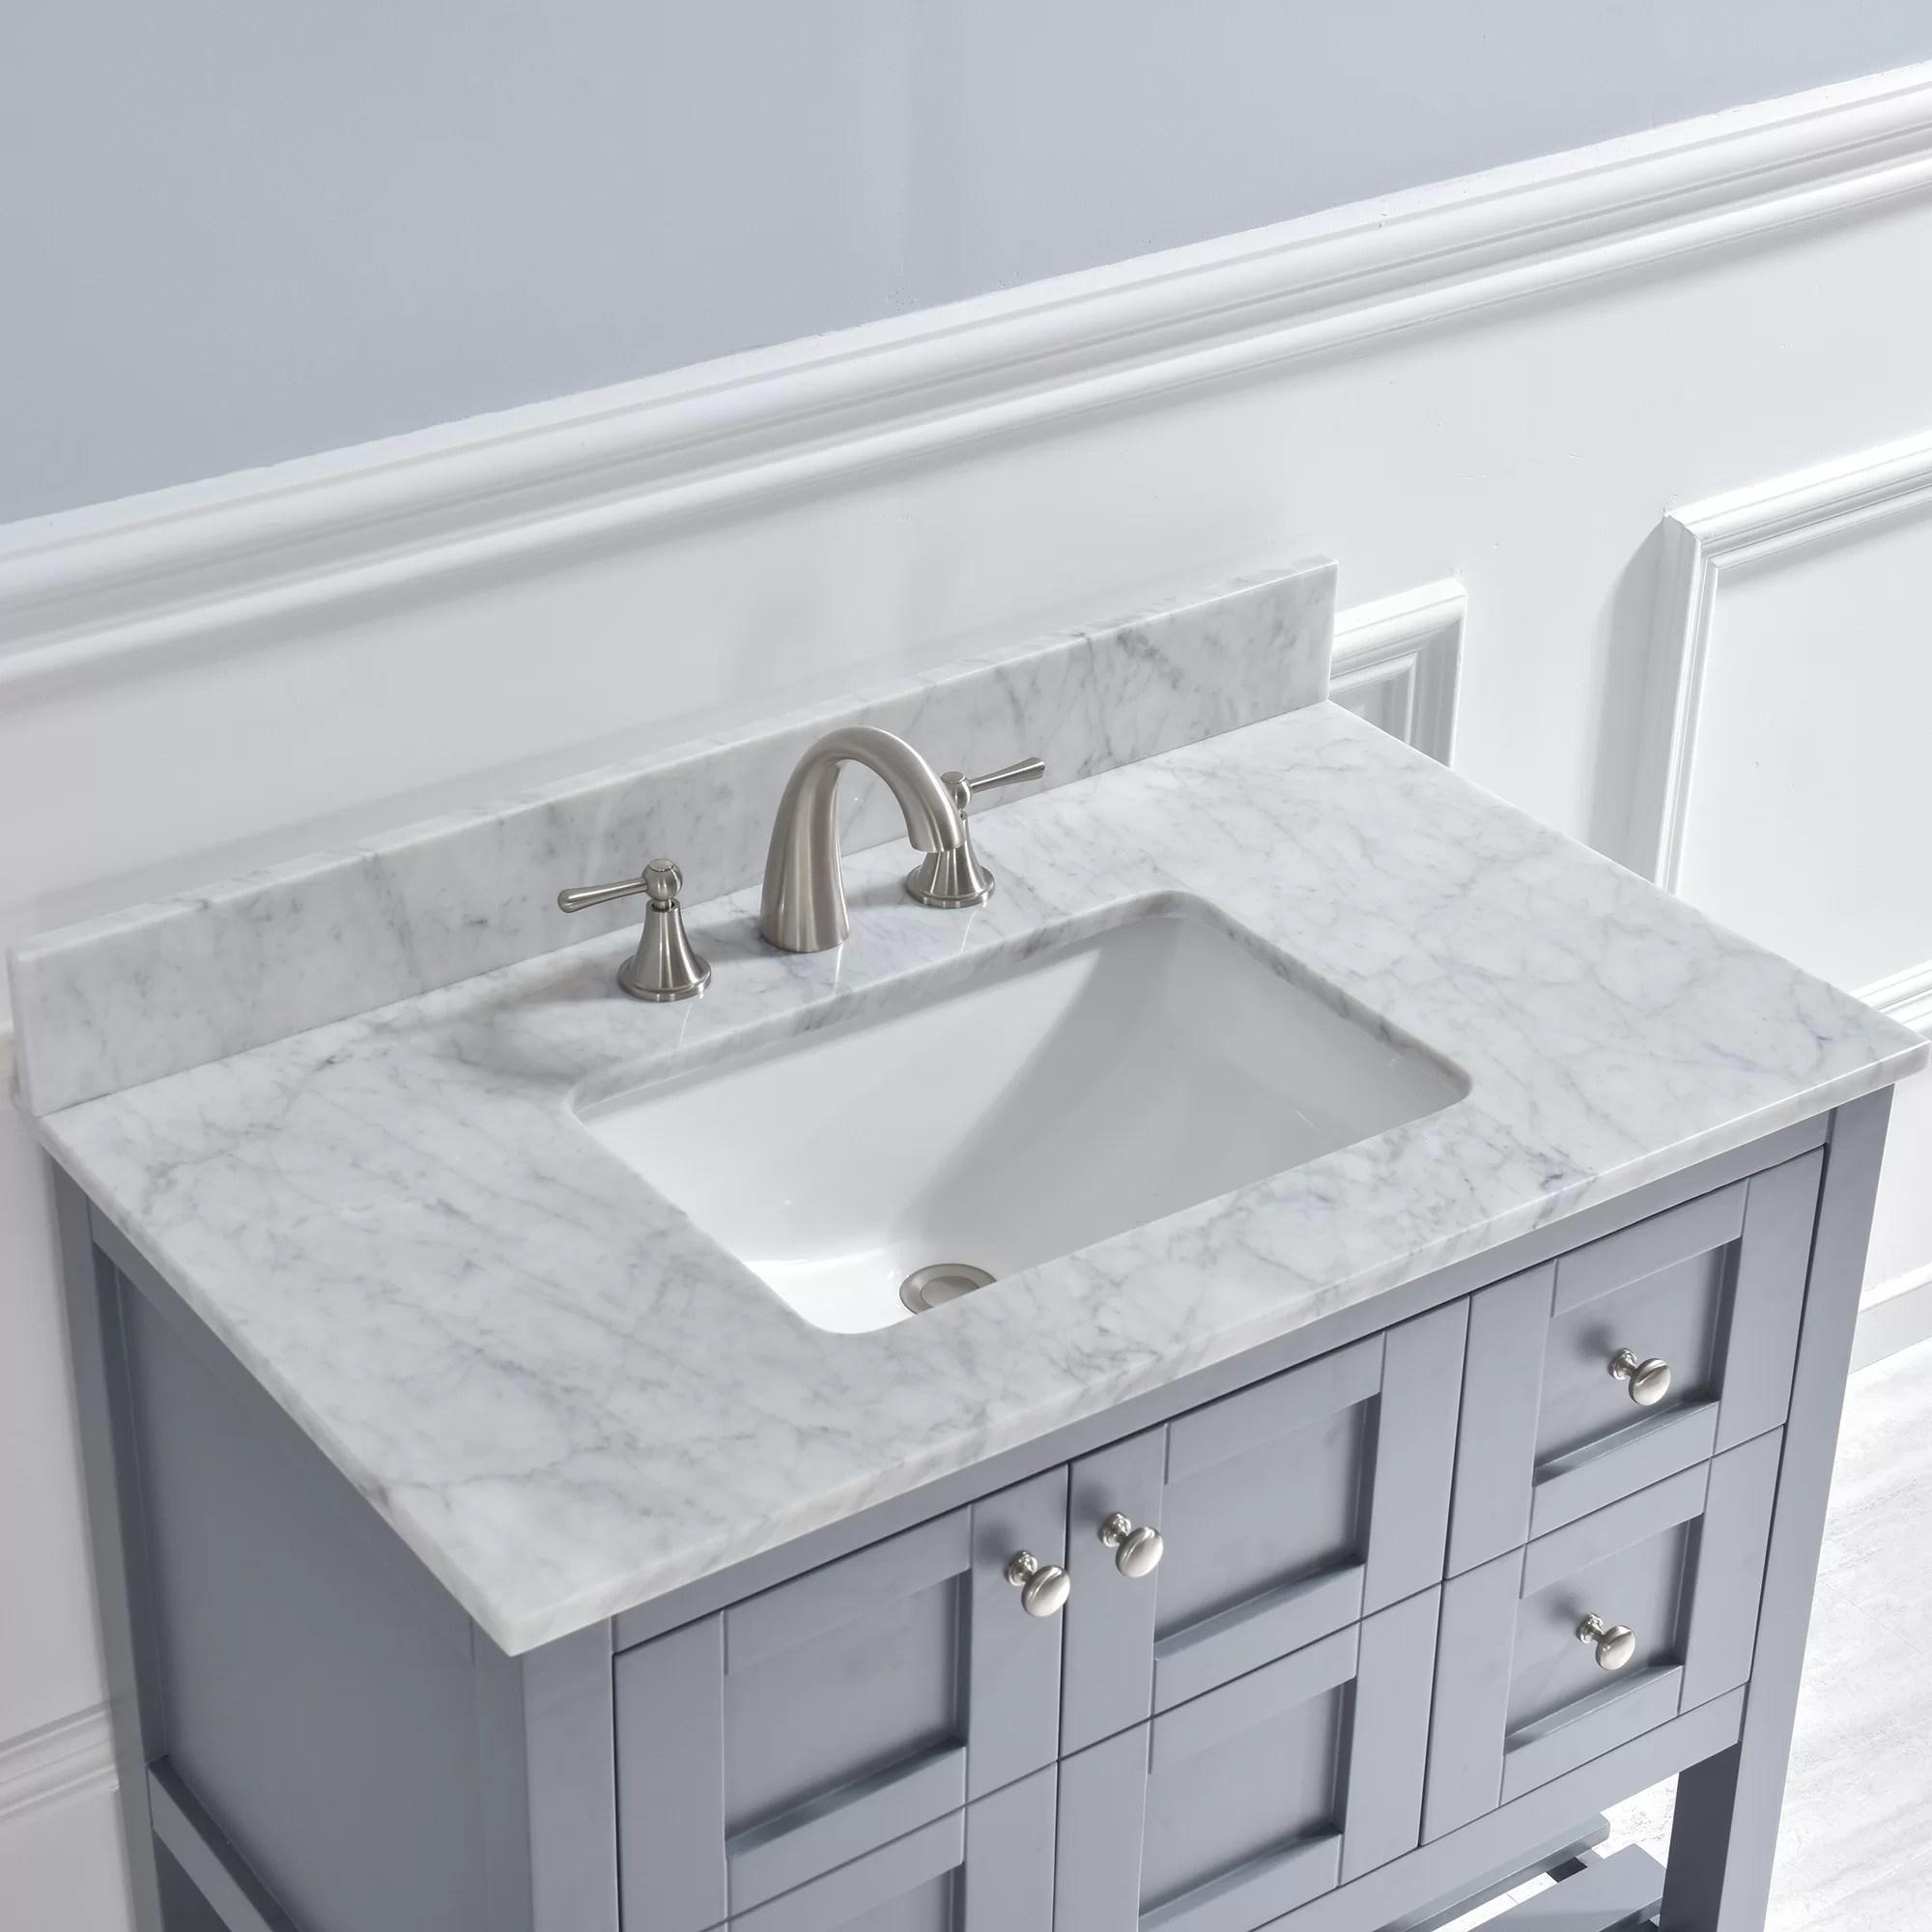 37 single bathroom vanity top in carra white with sink